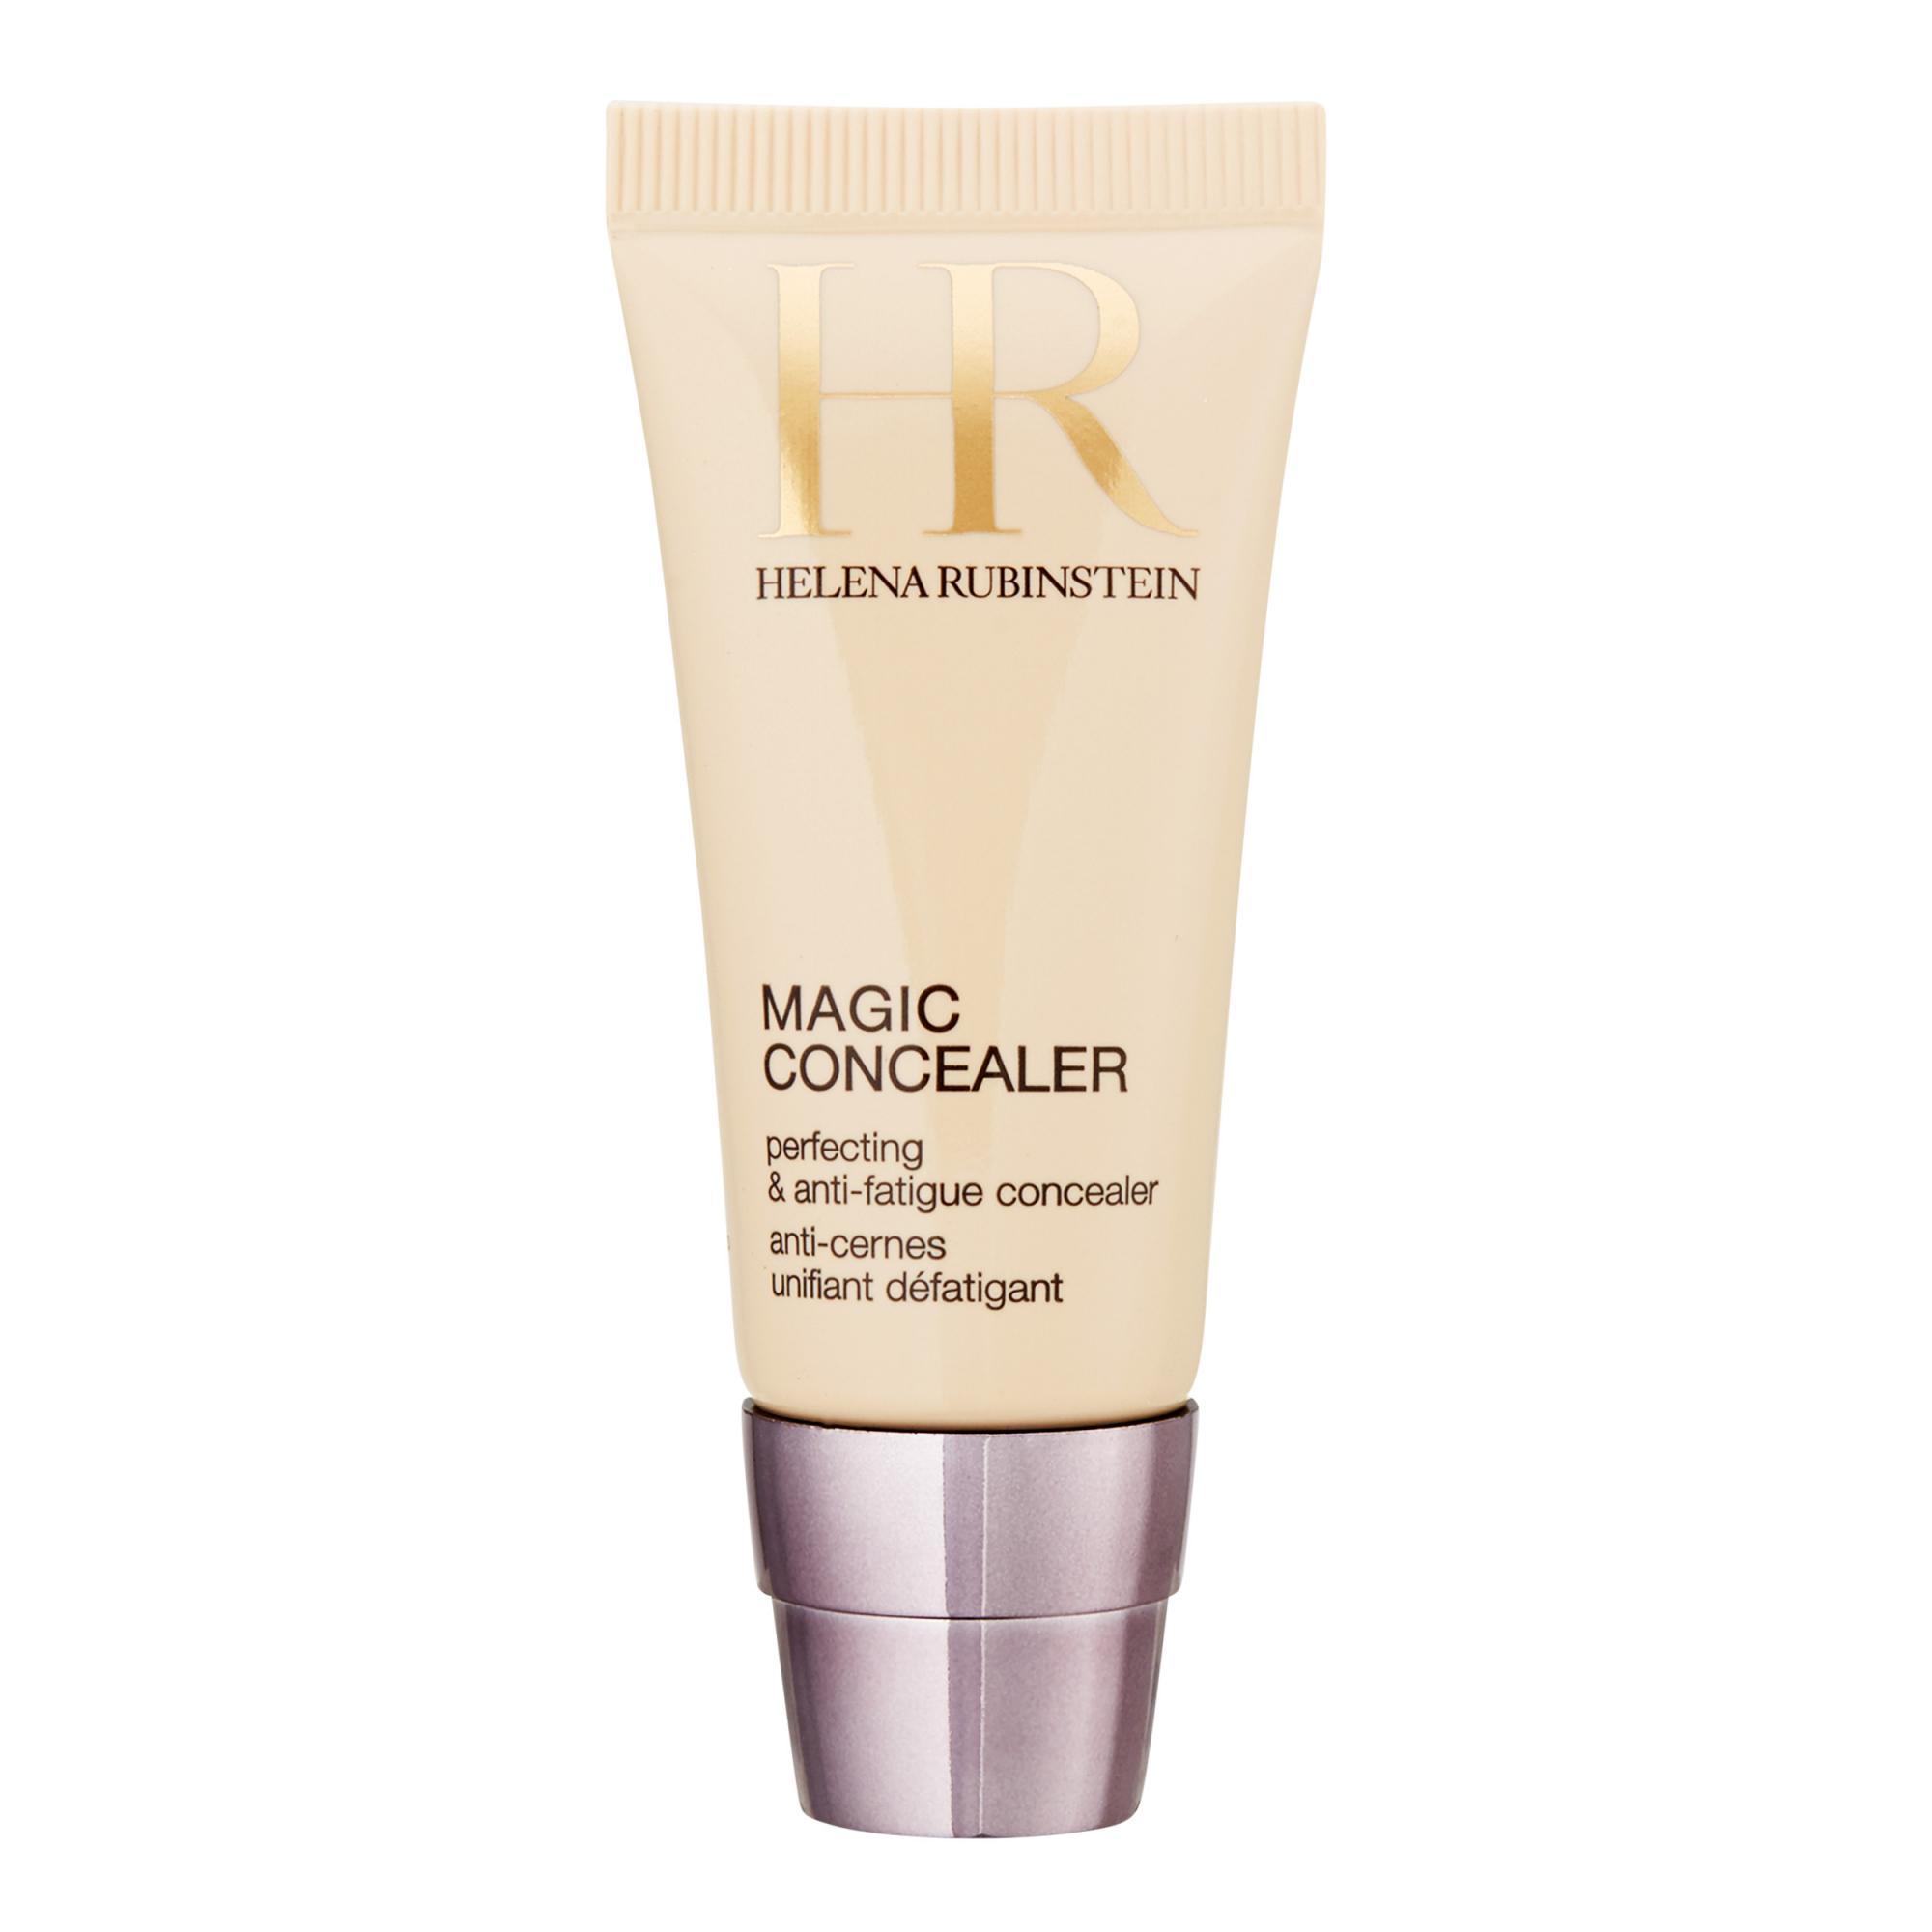 Helena Rubinstein Magic Concealer Anti Fatigue Concealer 15Ml 5Oz 02 Medium Intl Cheap